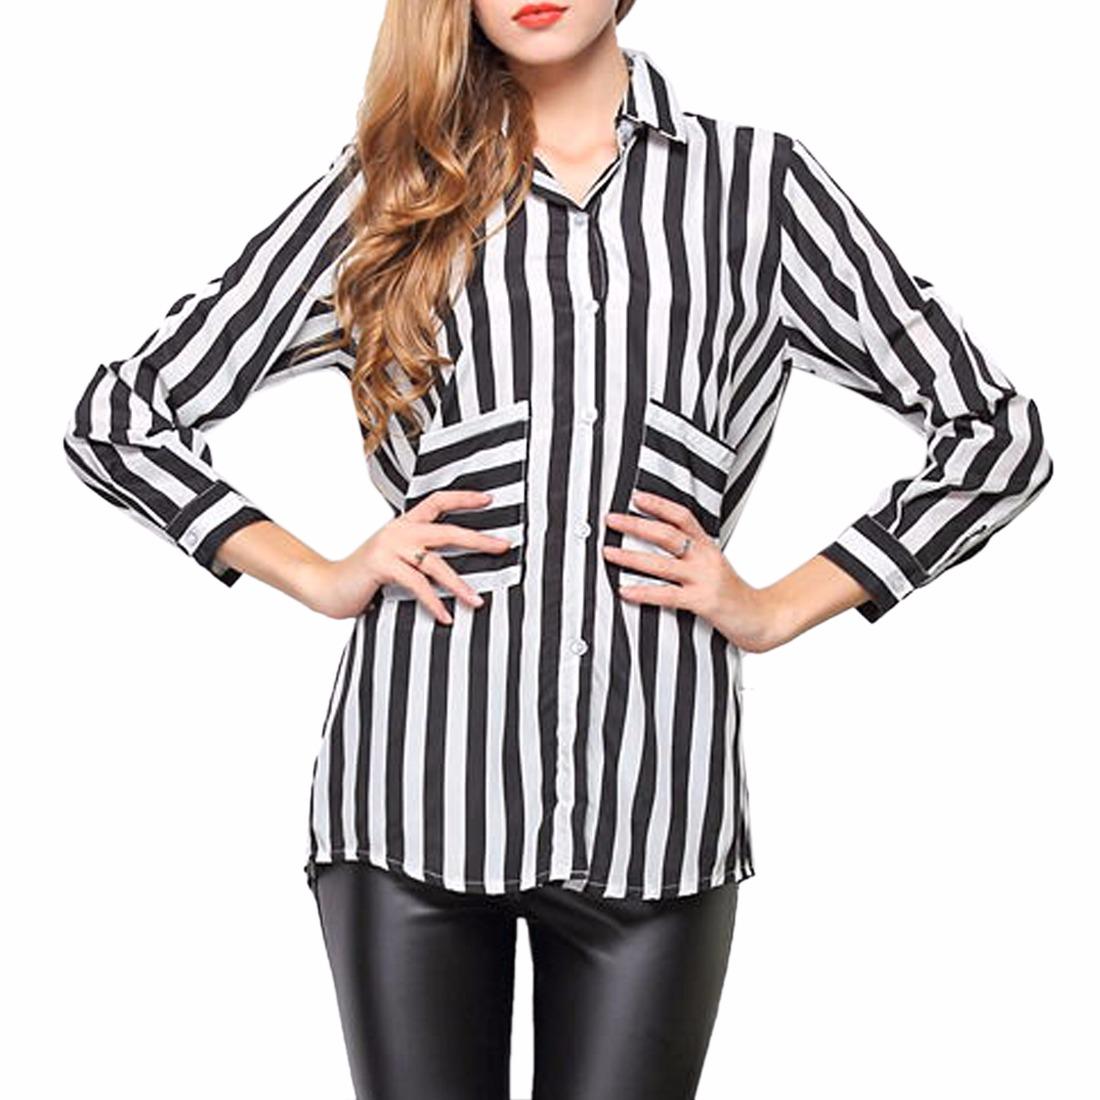 Costume Black White Striped Women Long Sleeve Lapel Chiffon Shirts Tops